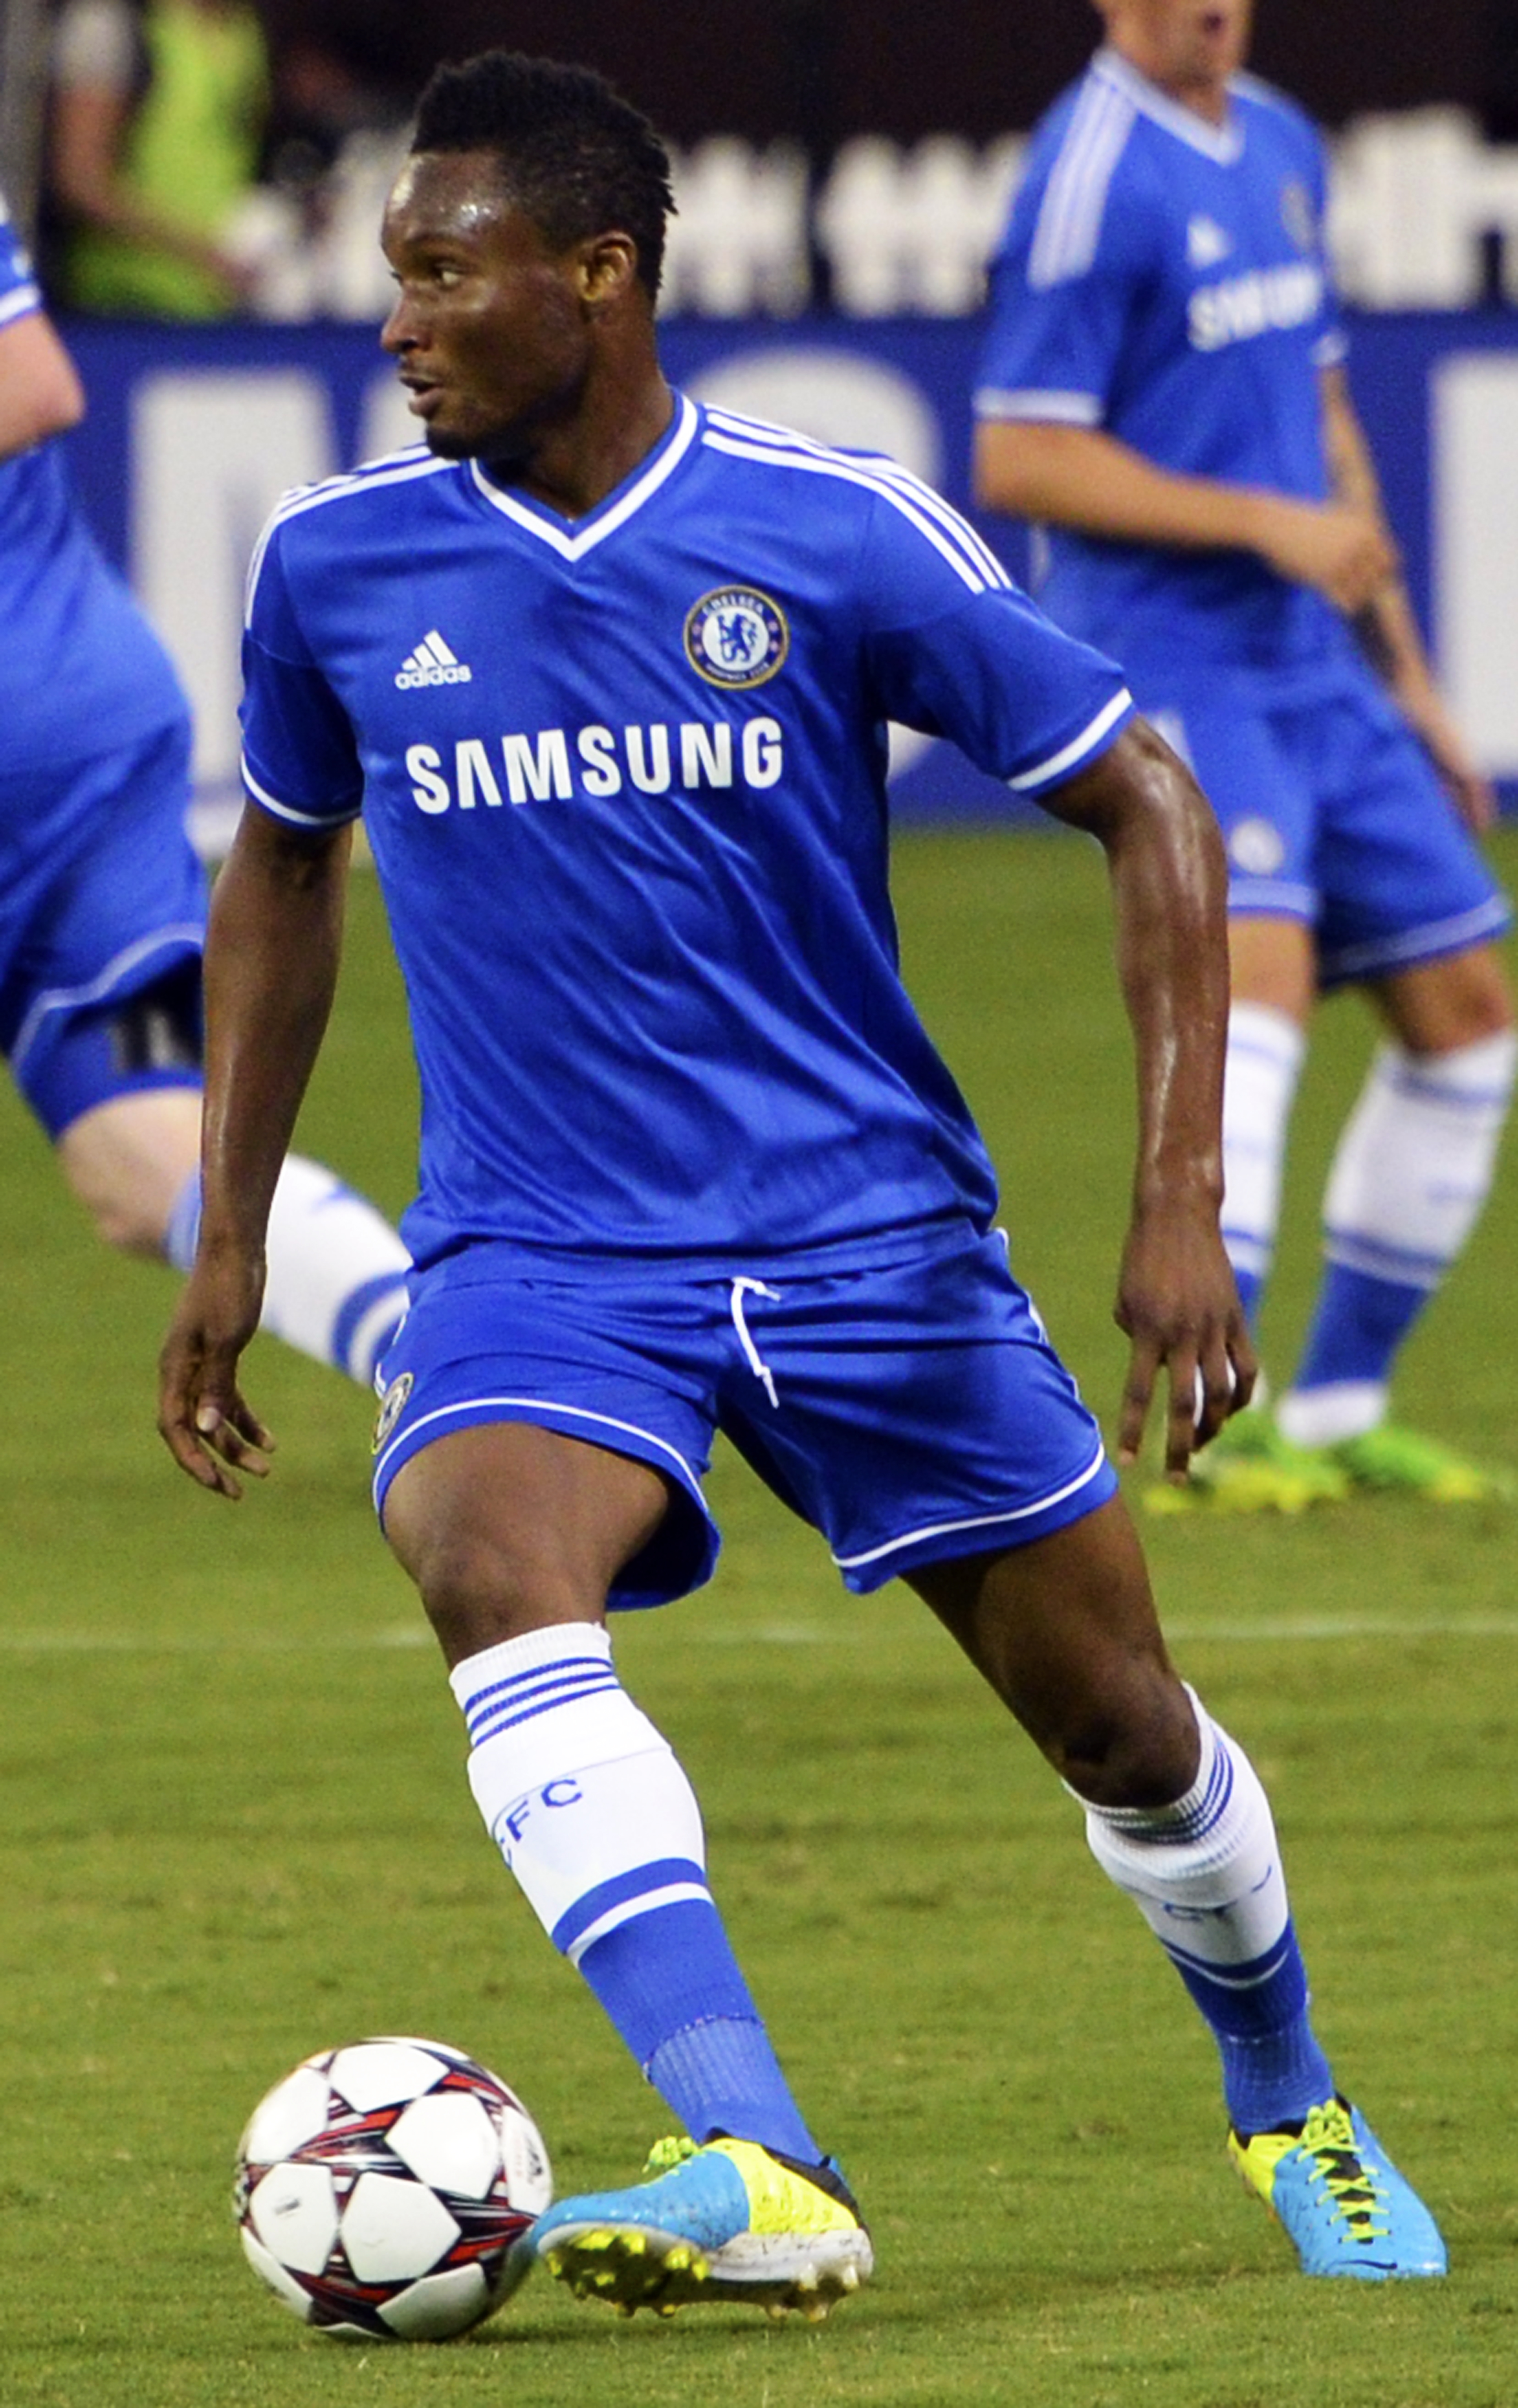 b034914ca723f ...  http   upload.wikimedia.org wikipedia commons 3 32 John Obi Mikel 02 Chelsea vs AS-Roma 10AUG2013.jpg